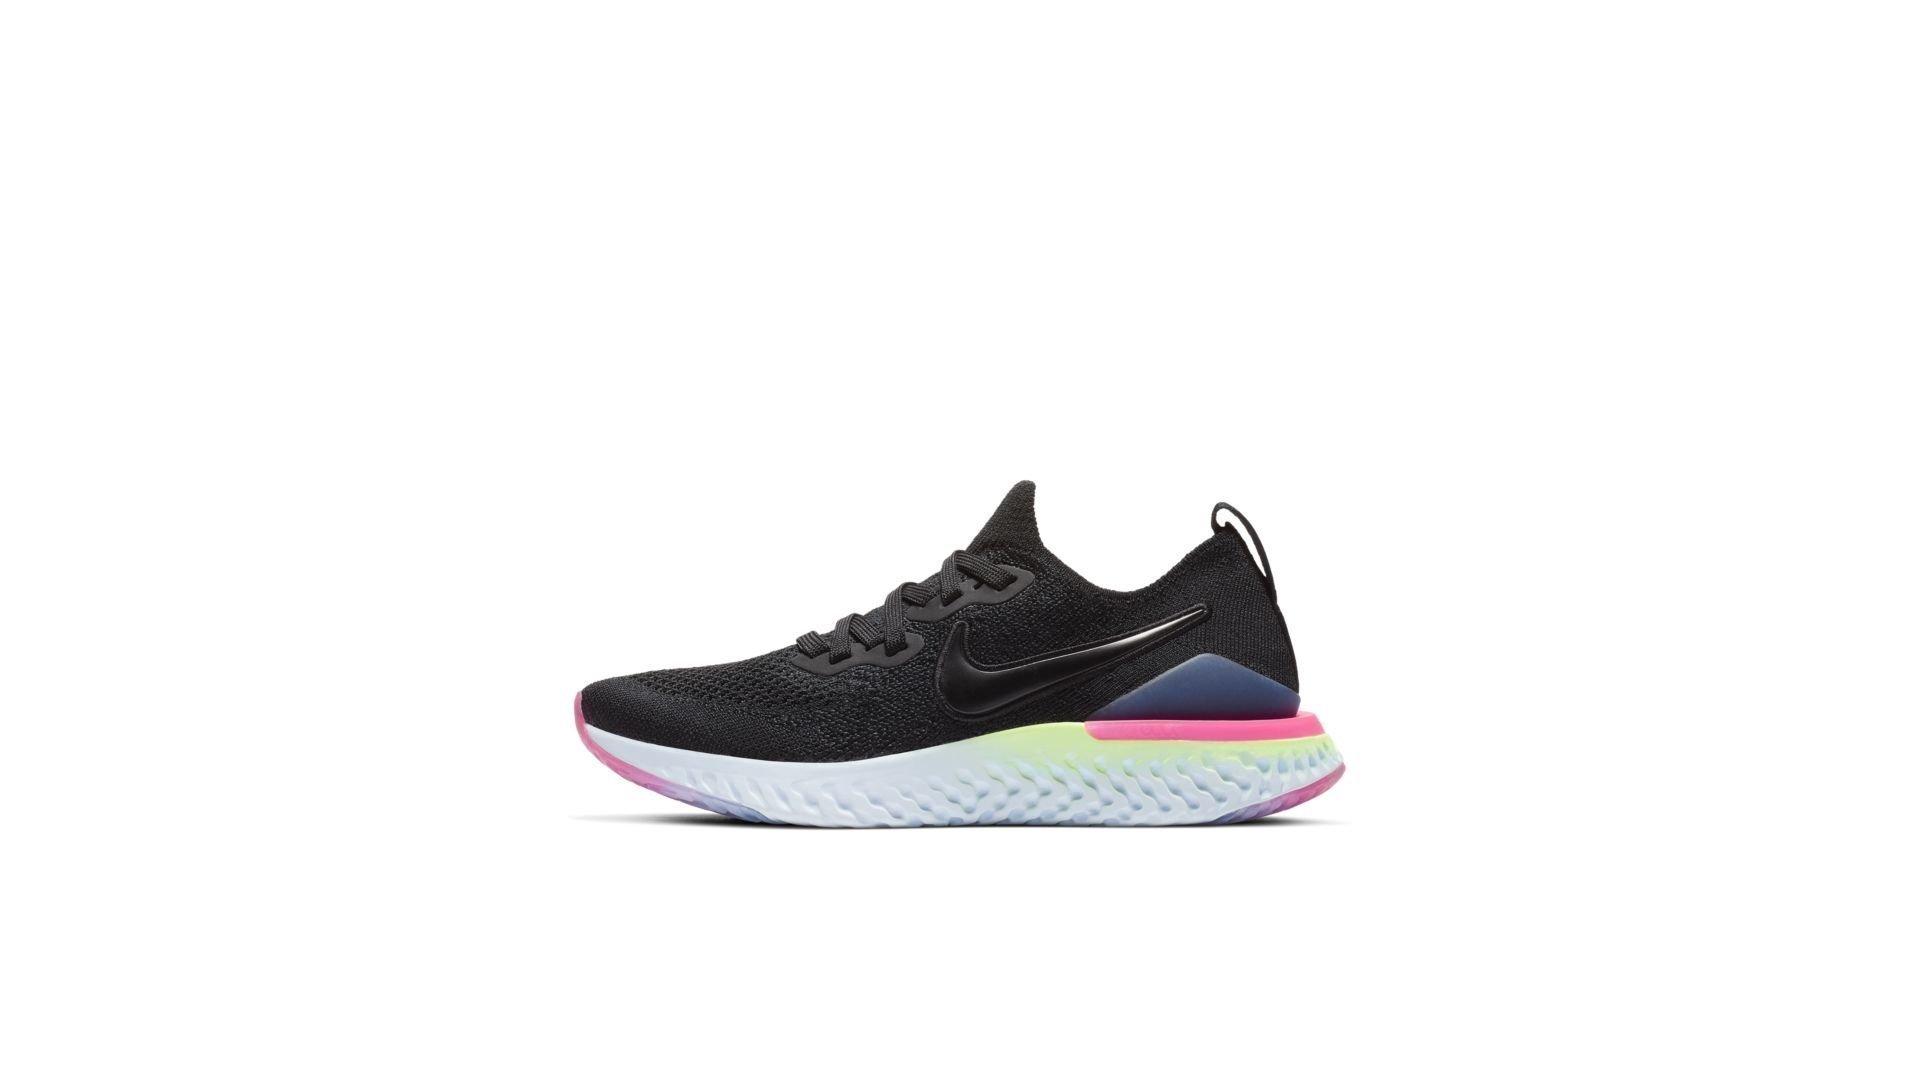 Nike Epic React Flyknit 2 Black Sapphire Hyper Pink (GS) (AQ3243-003)